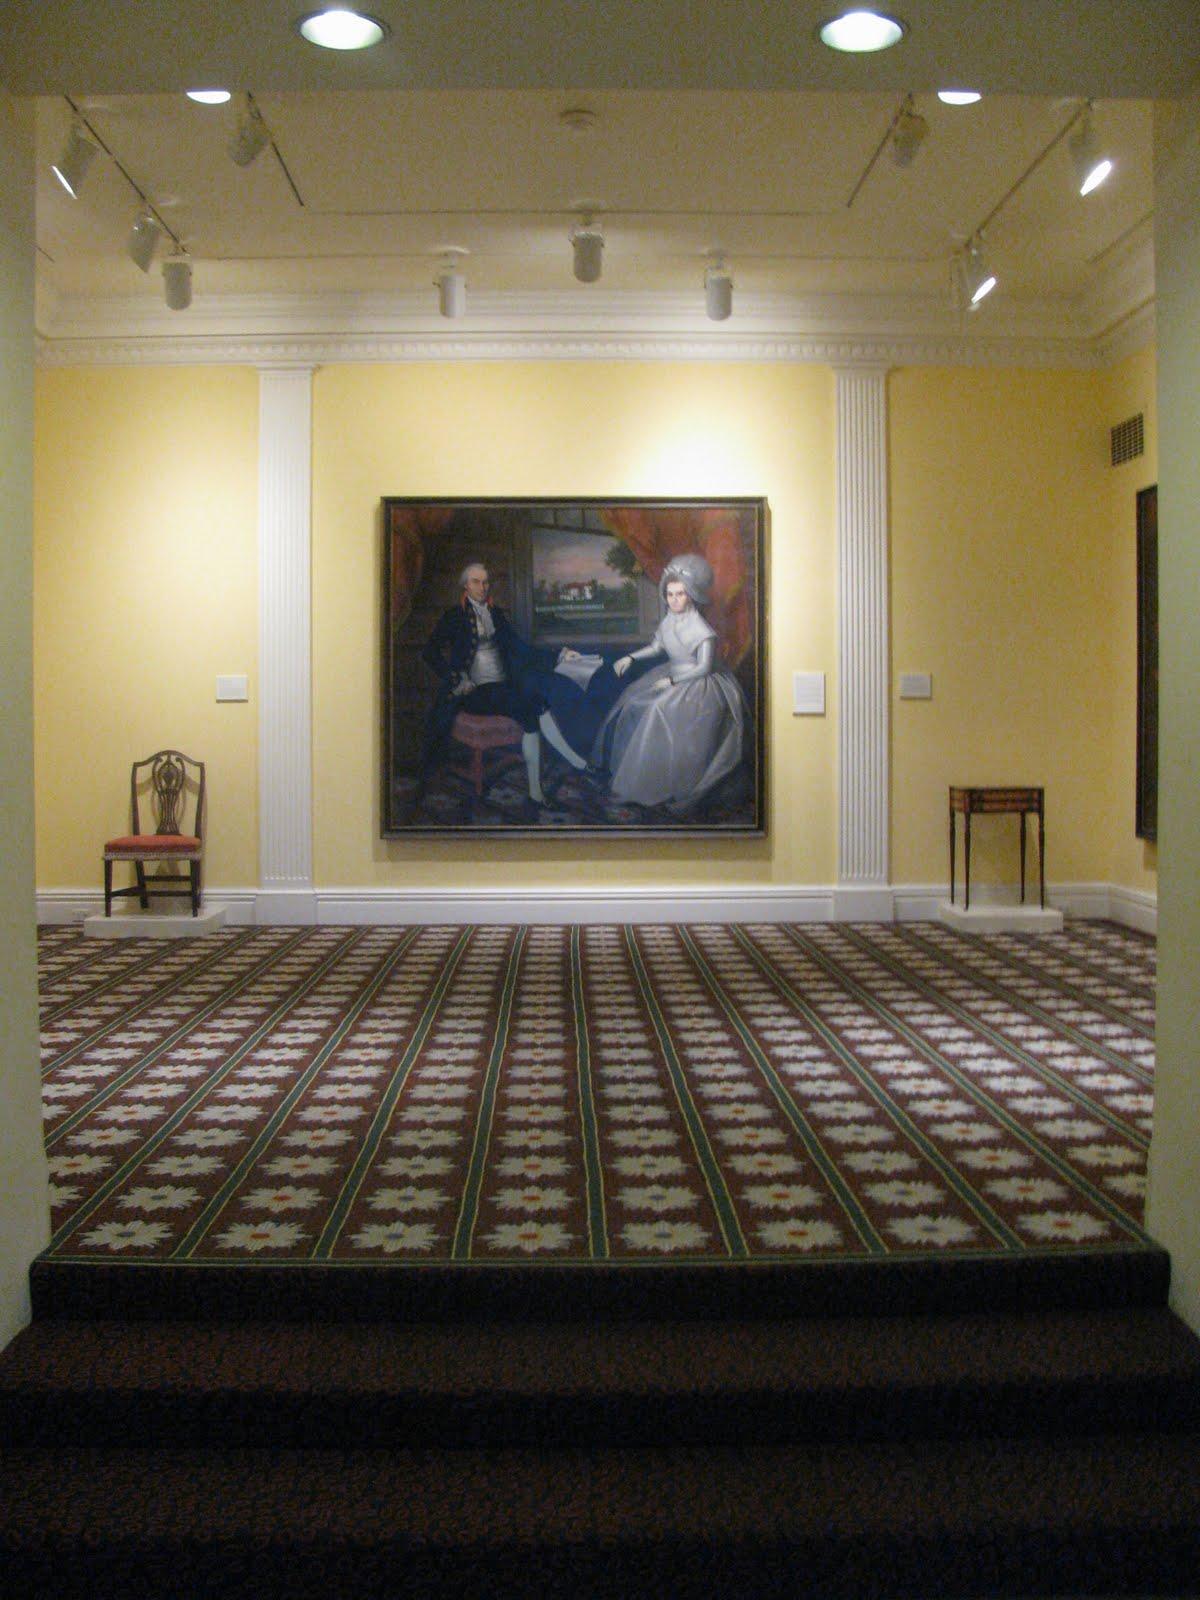 the 18th century american room